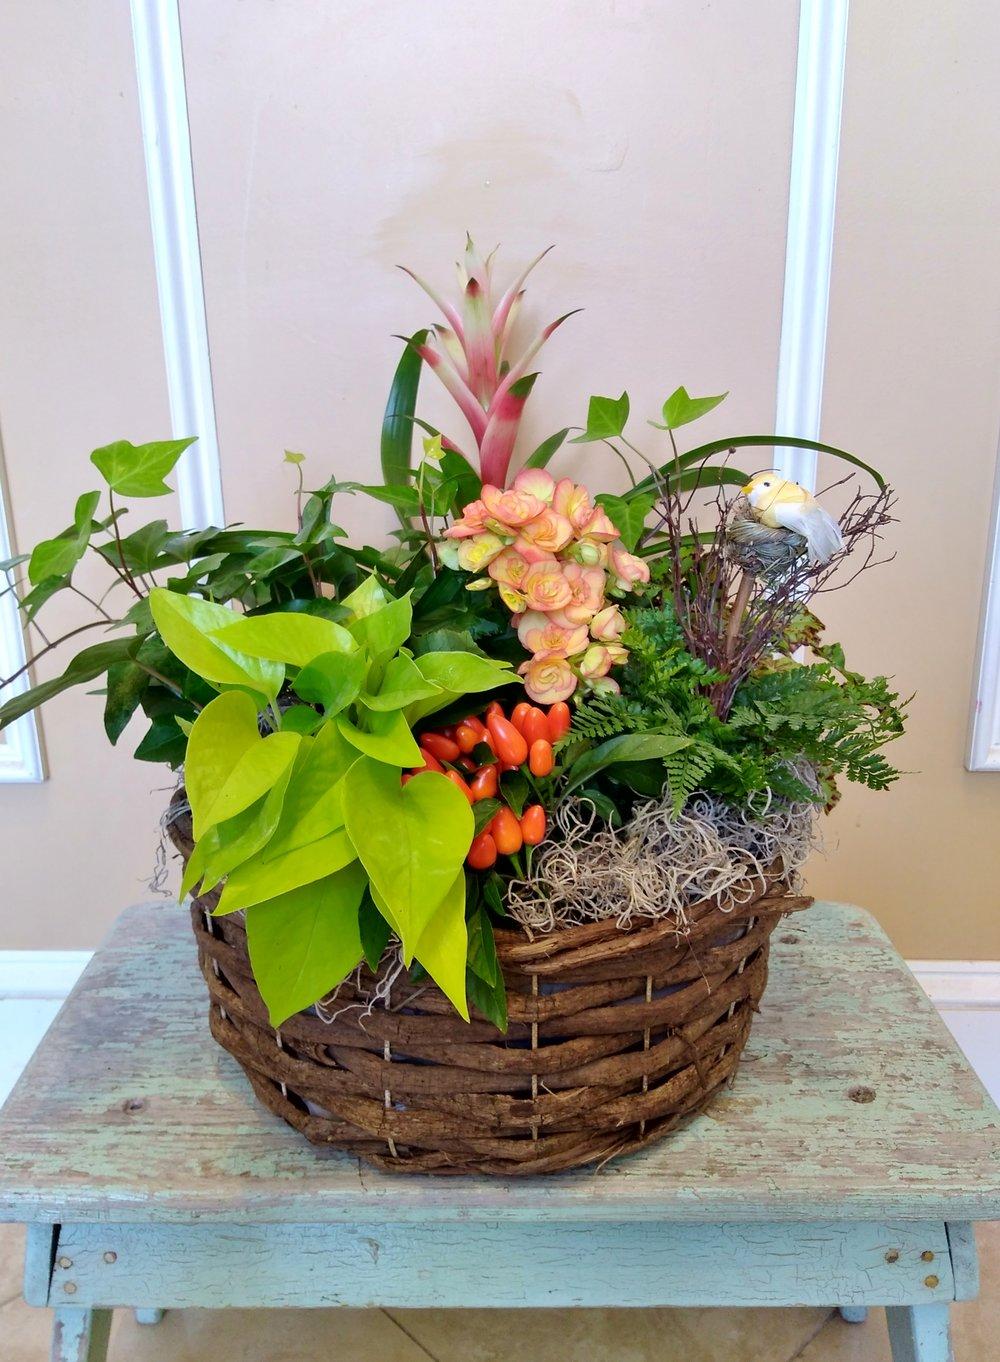 E12   $60 - $125 European plant basket. $60 as shown.